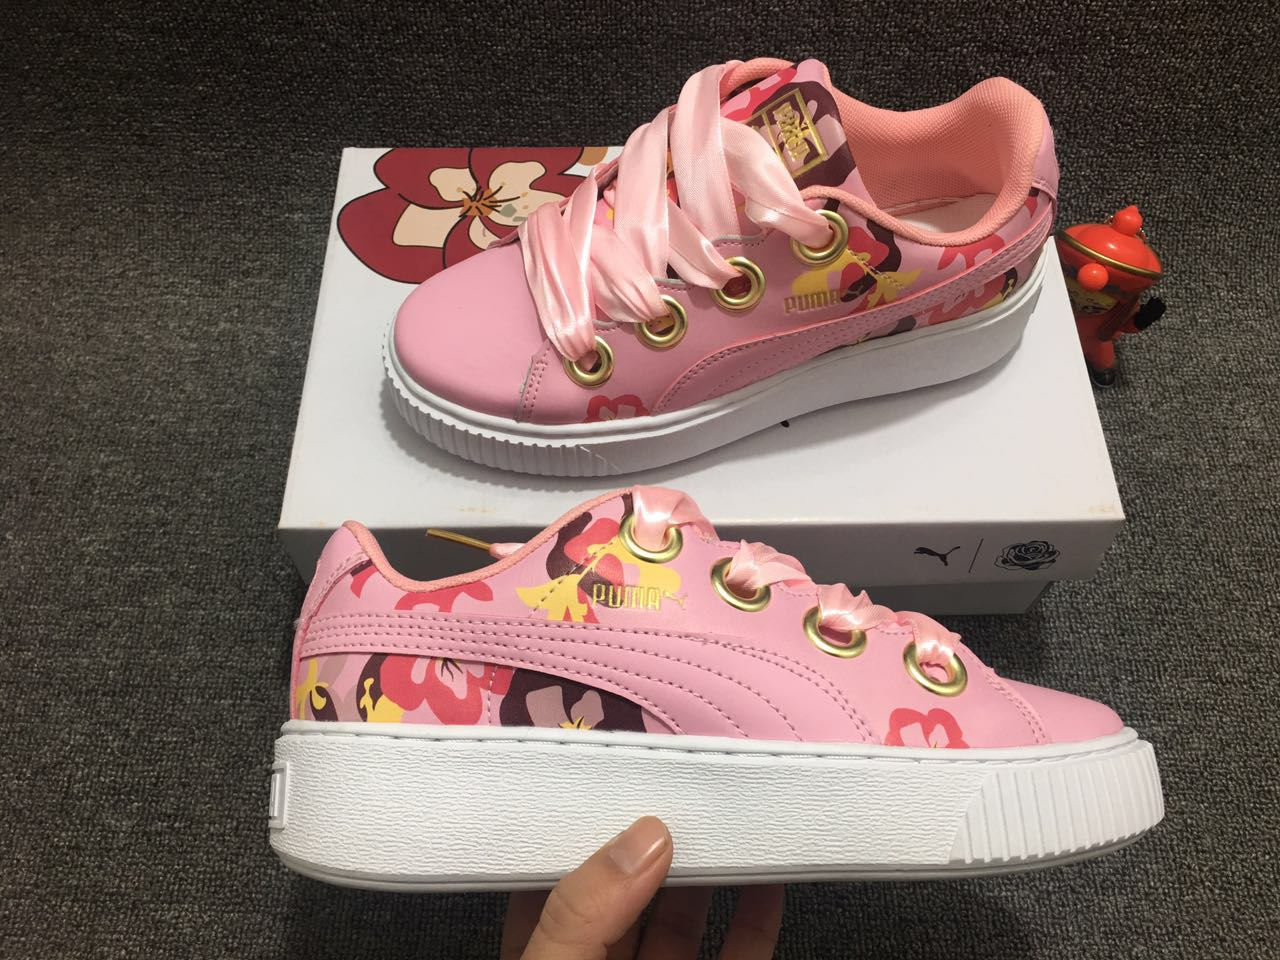 2018 New Arrival PUMA Rihannas Womens shoes Pescara kawasaki Breathable Sneakers Badminton Shoes size36-40